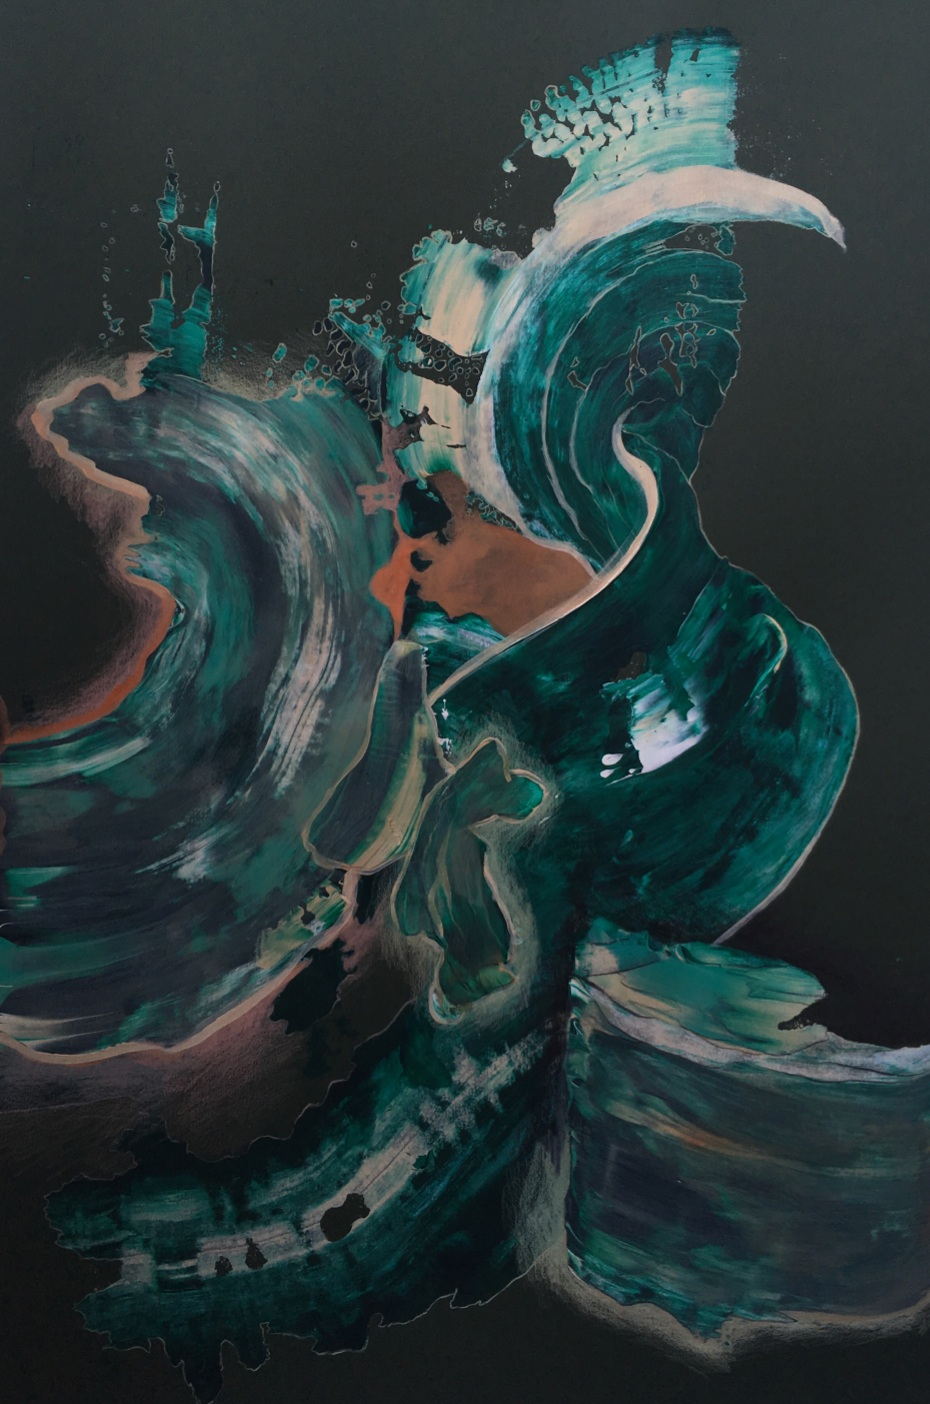 Invoking emerald